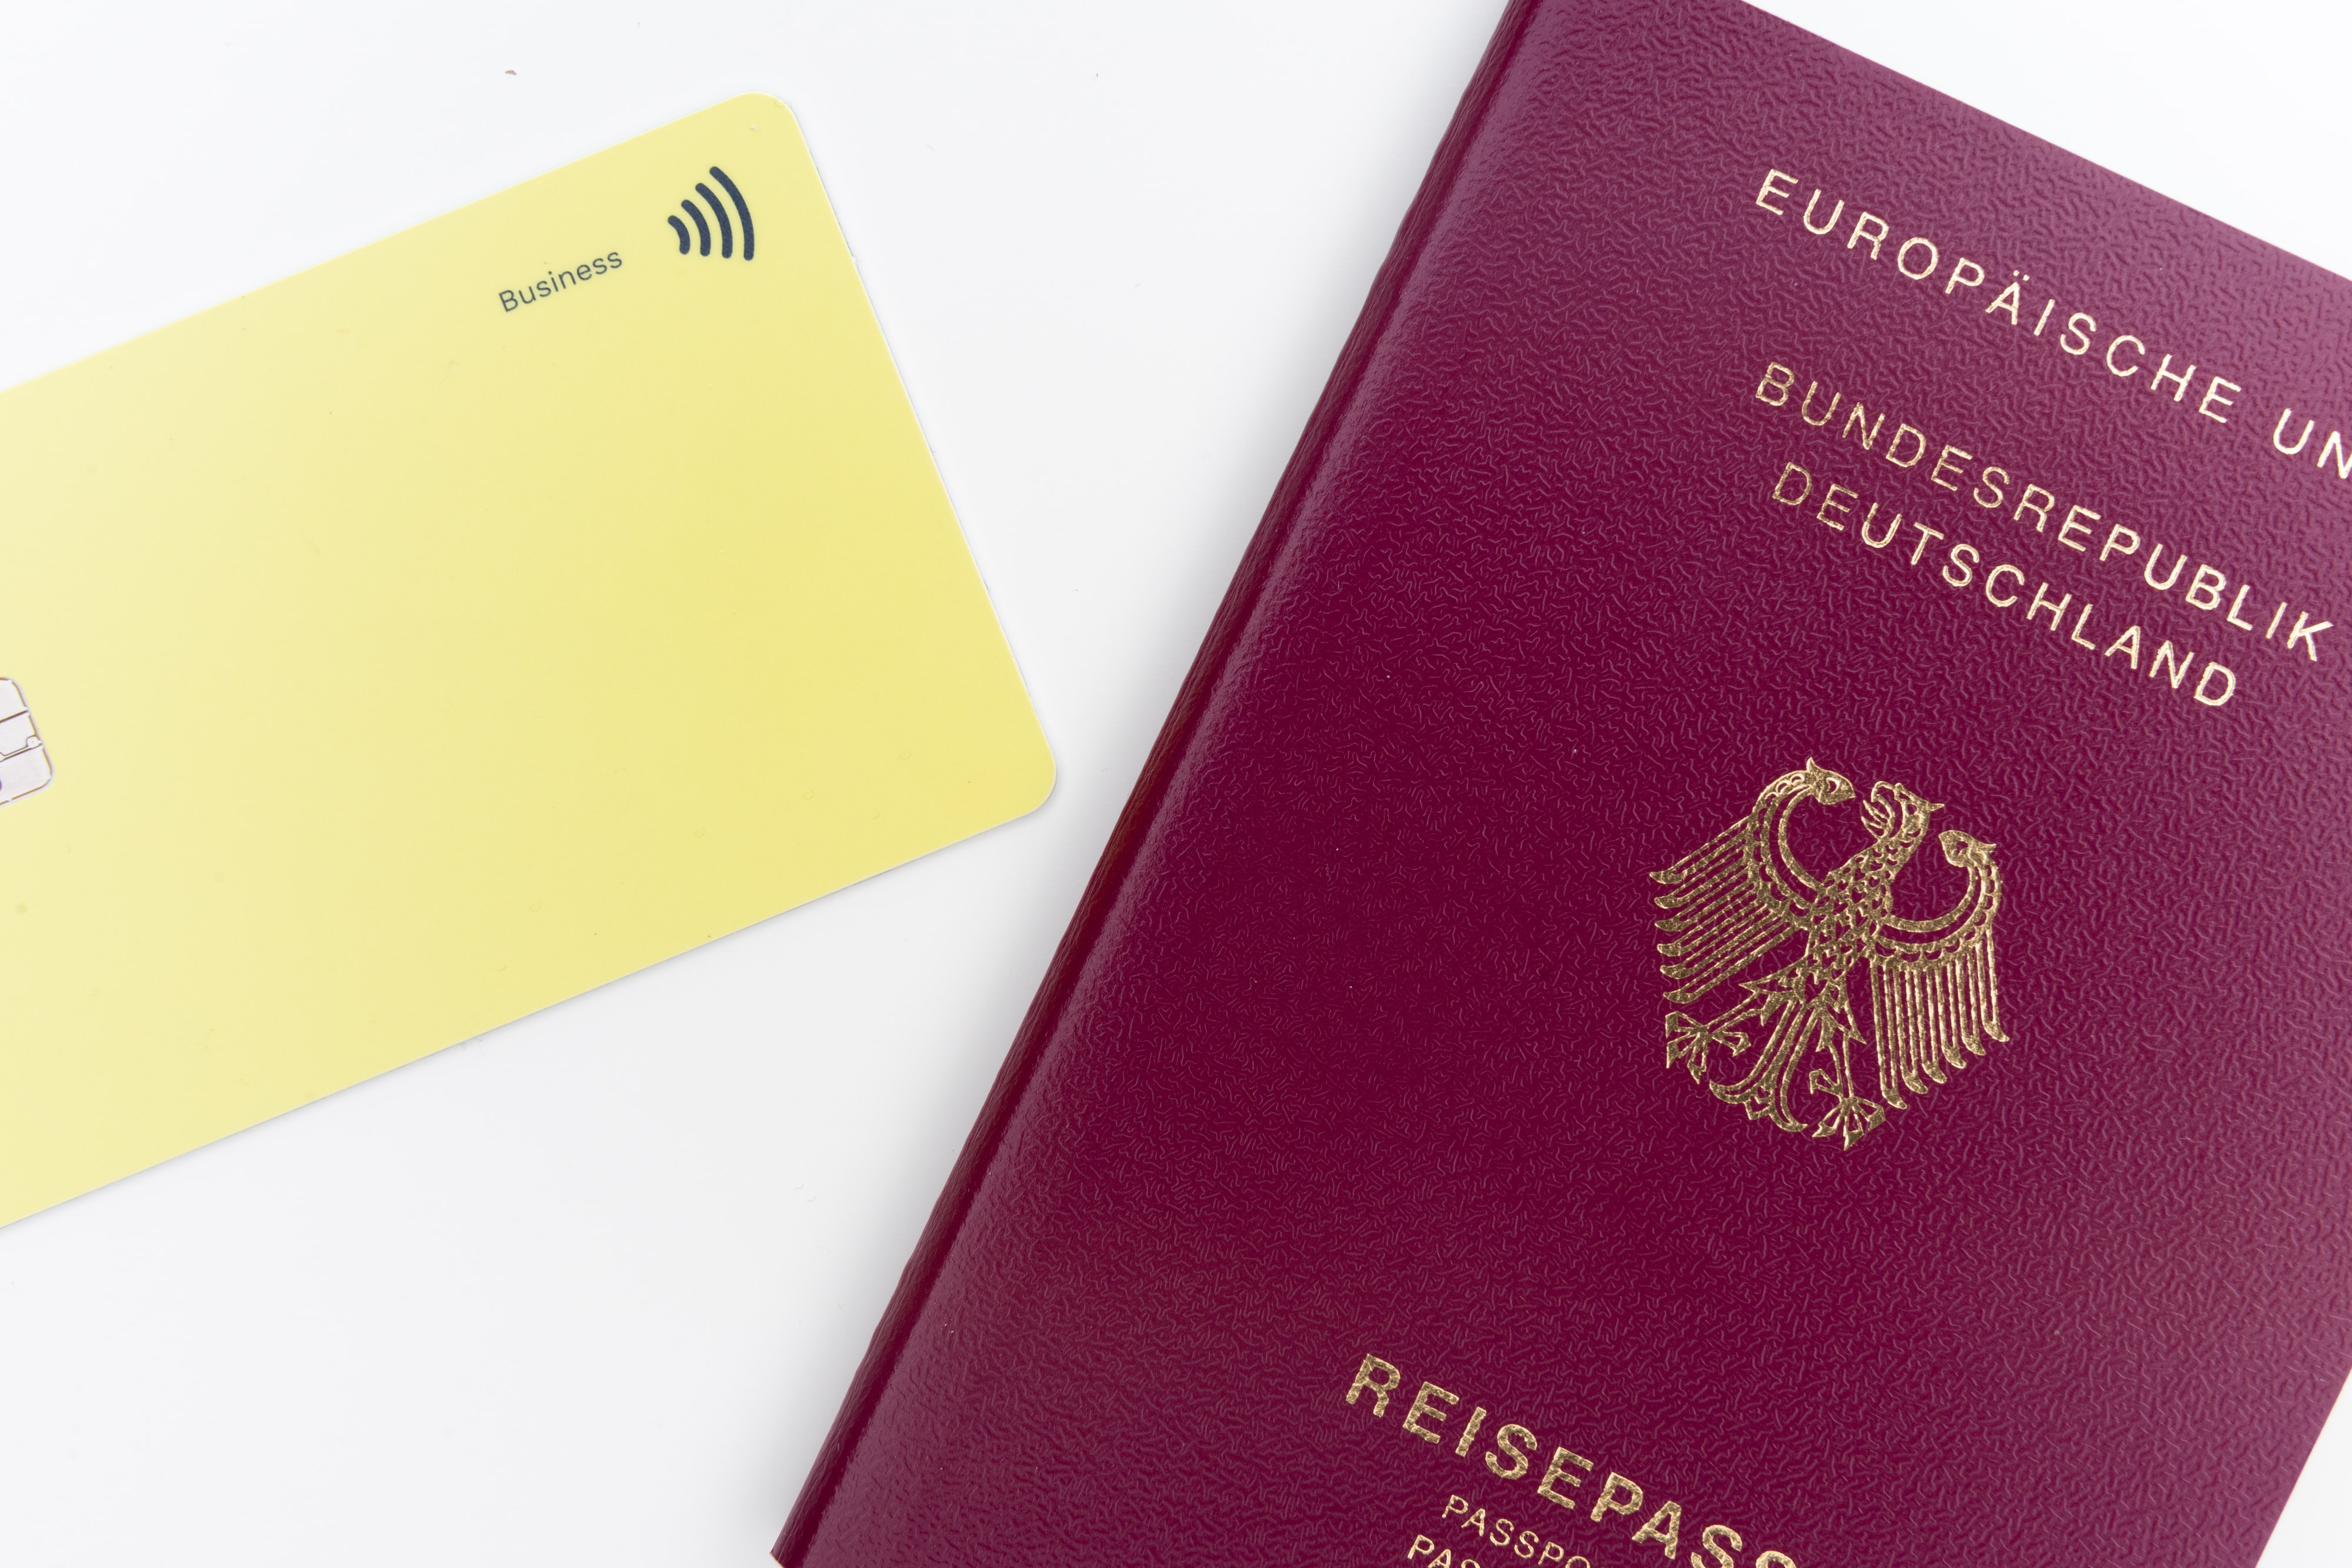 EU golden Visa Europe golden visa